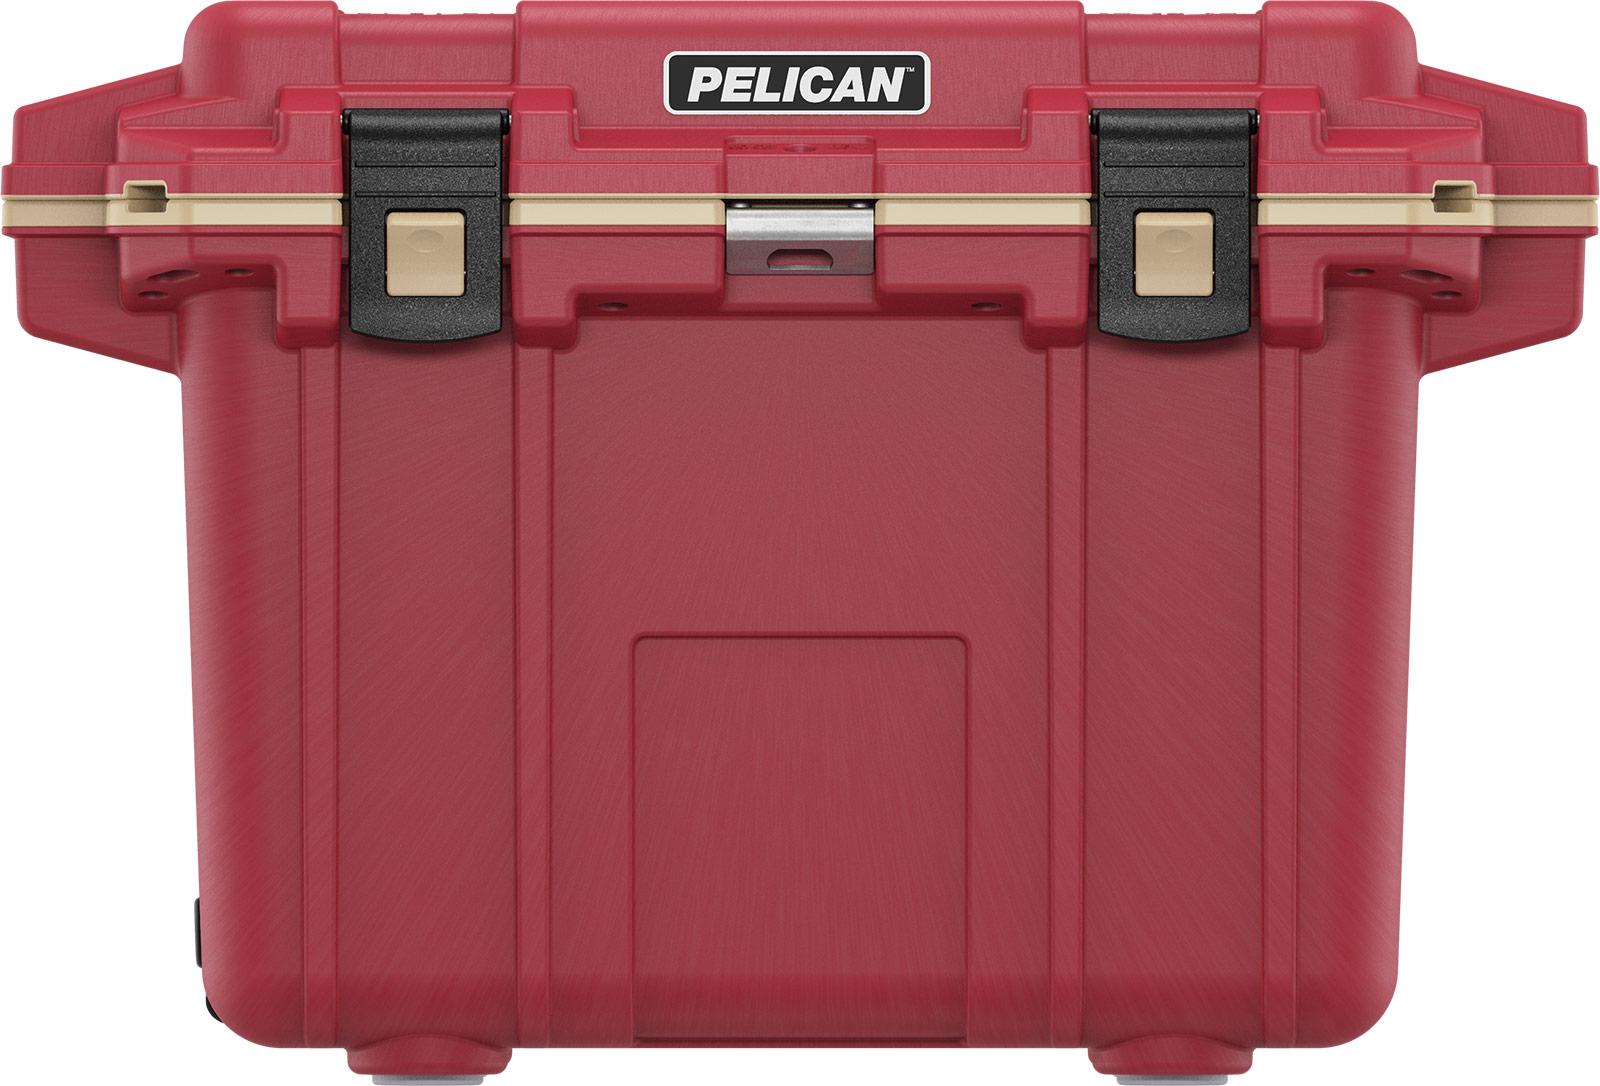 pelican red overland coolers 50qt cooler